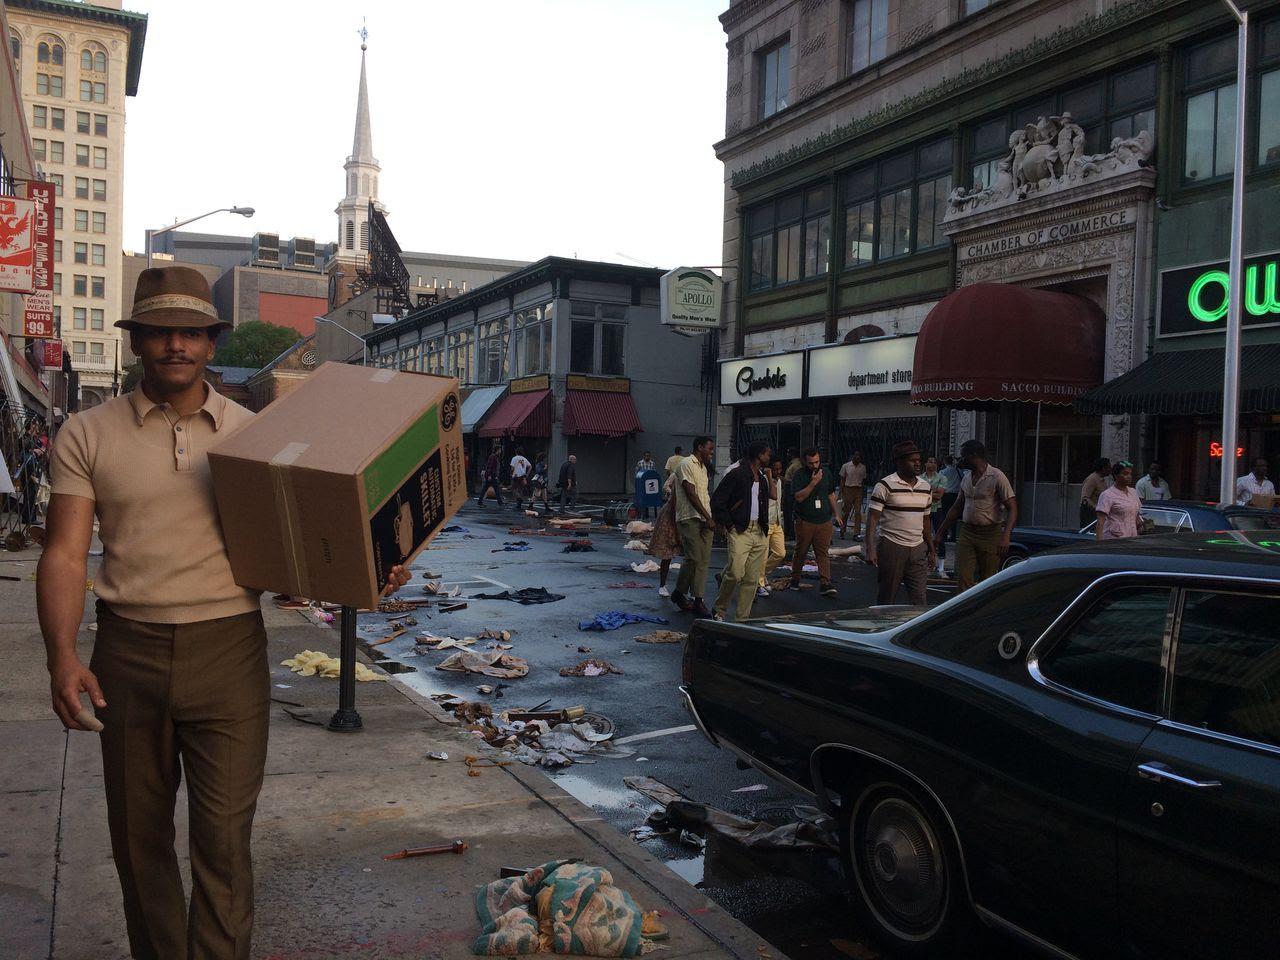 'Sopranos' prequel 'The Many Saints of Newark' postponed 6 months